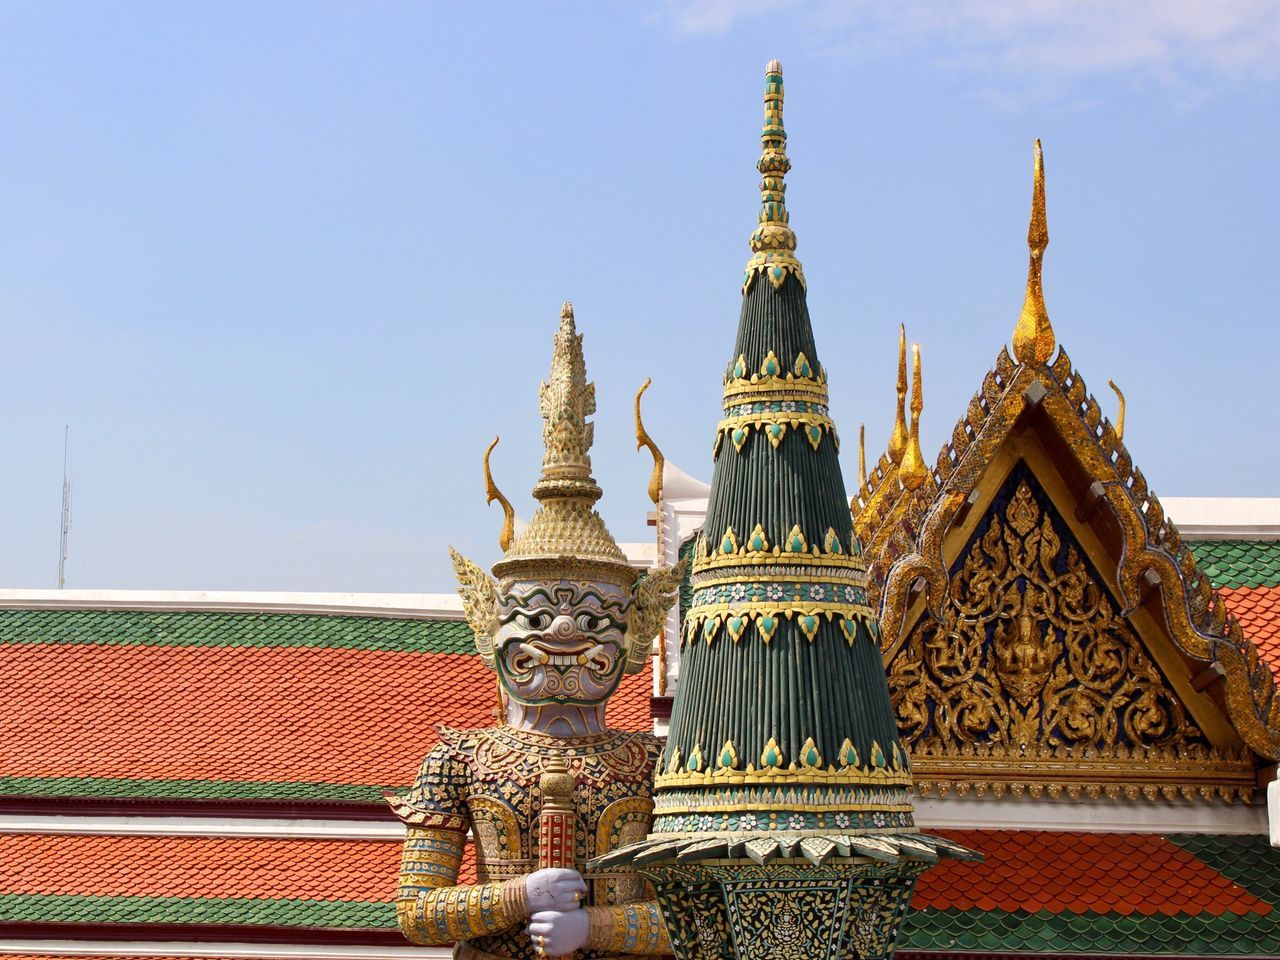 First Eyeem Photo Grand Palace Bangkok Thailand Architecture Place Of Worship Thailand Statue